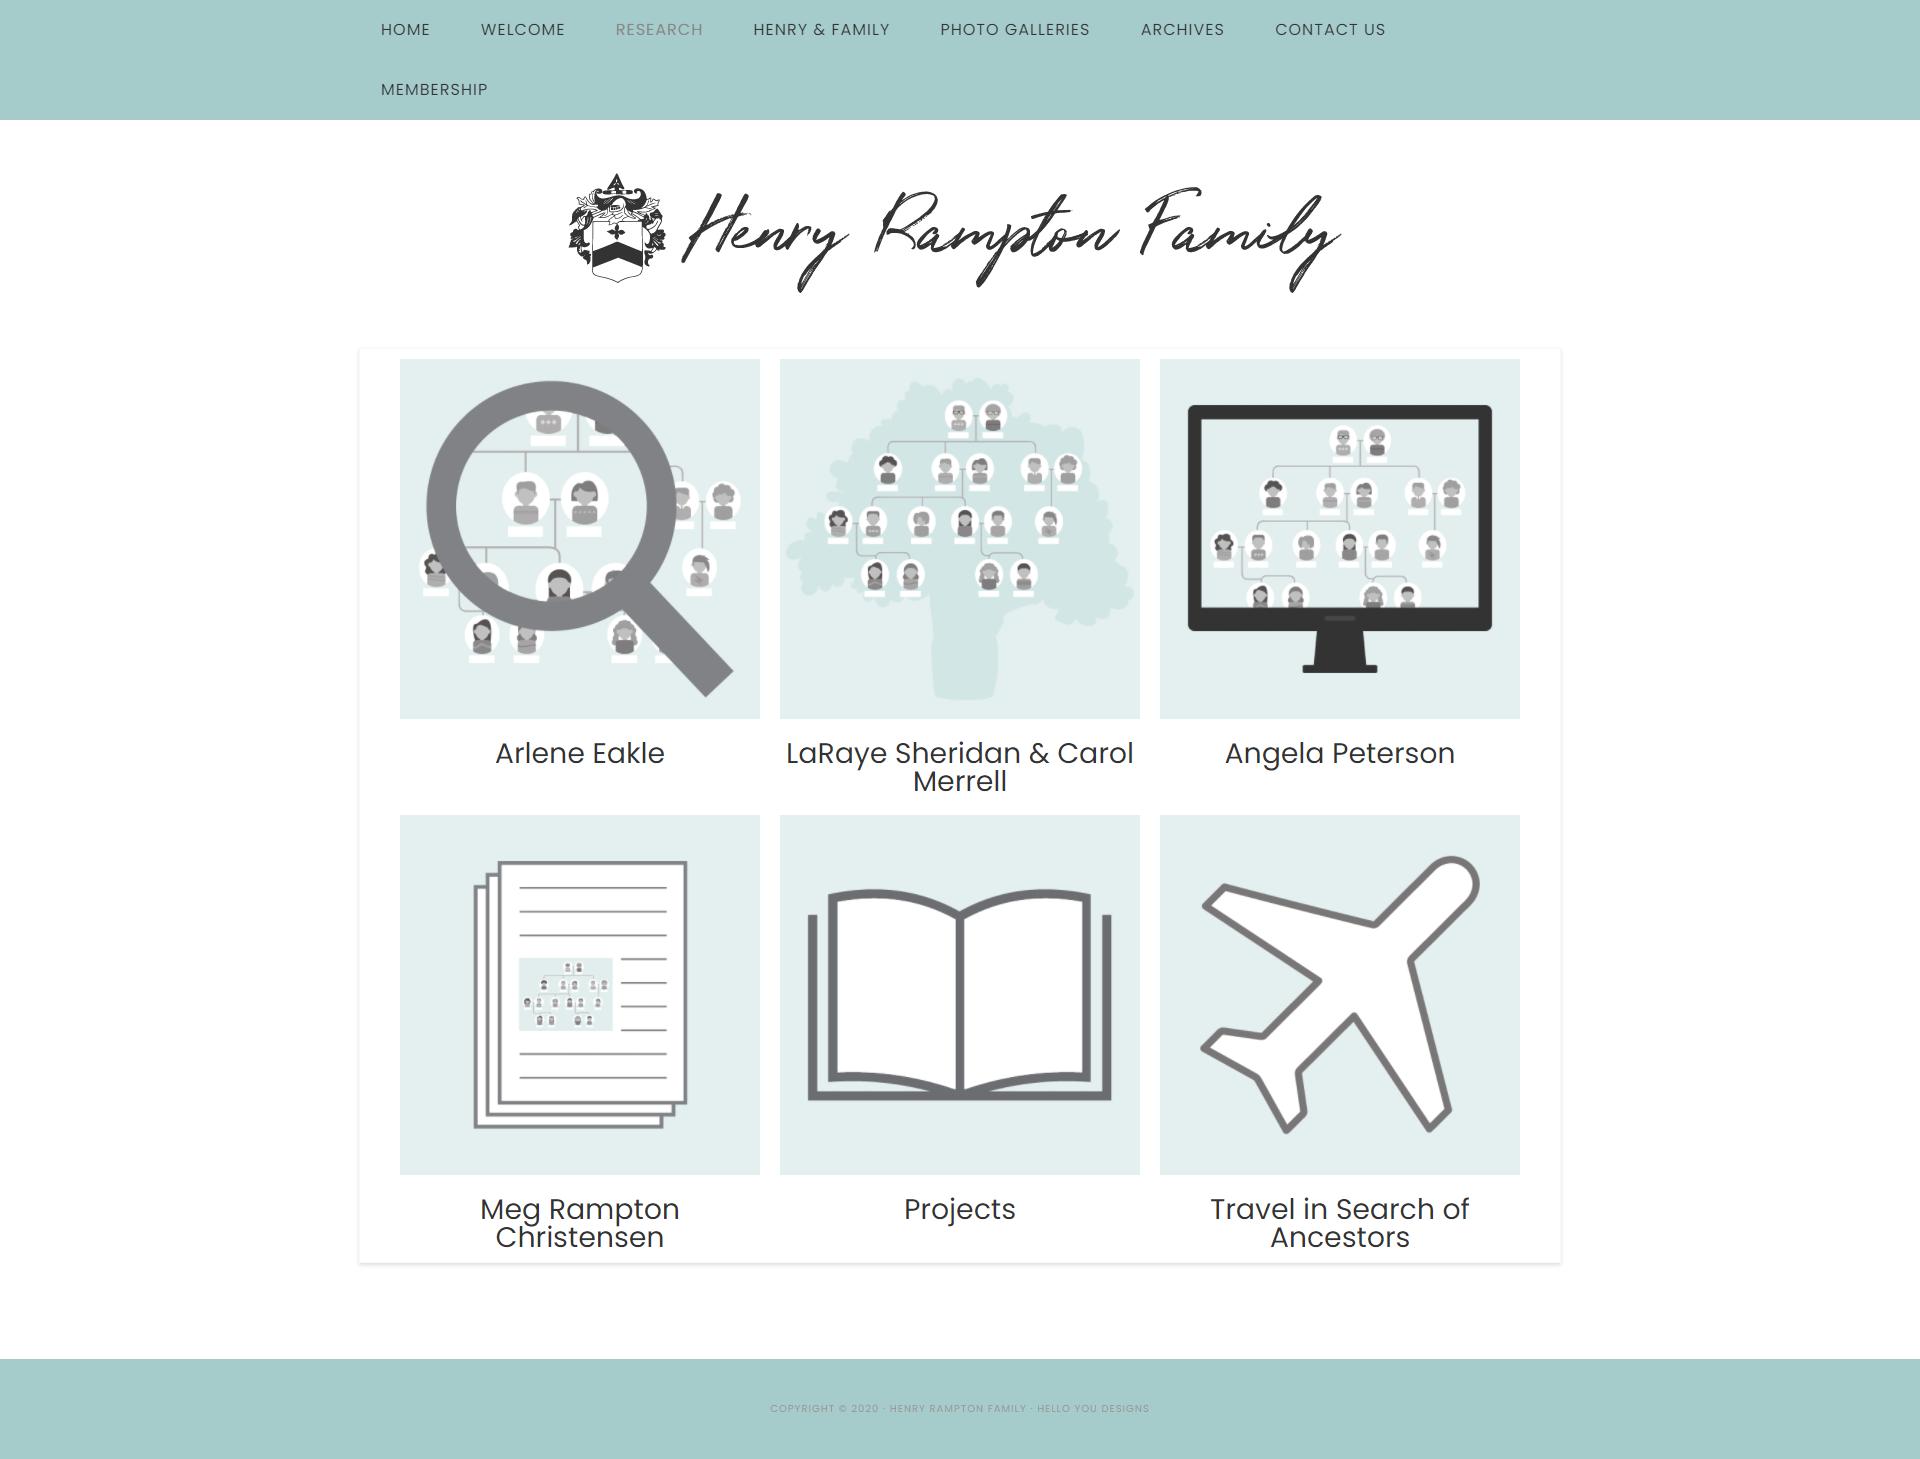 screencapture-henryramptonfamily-org